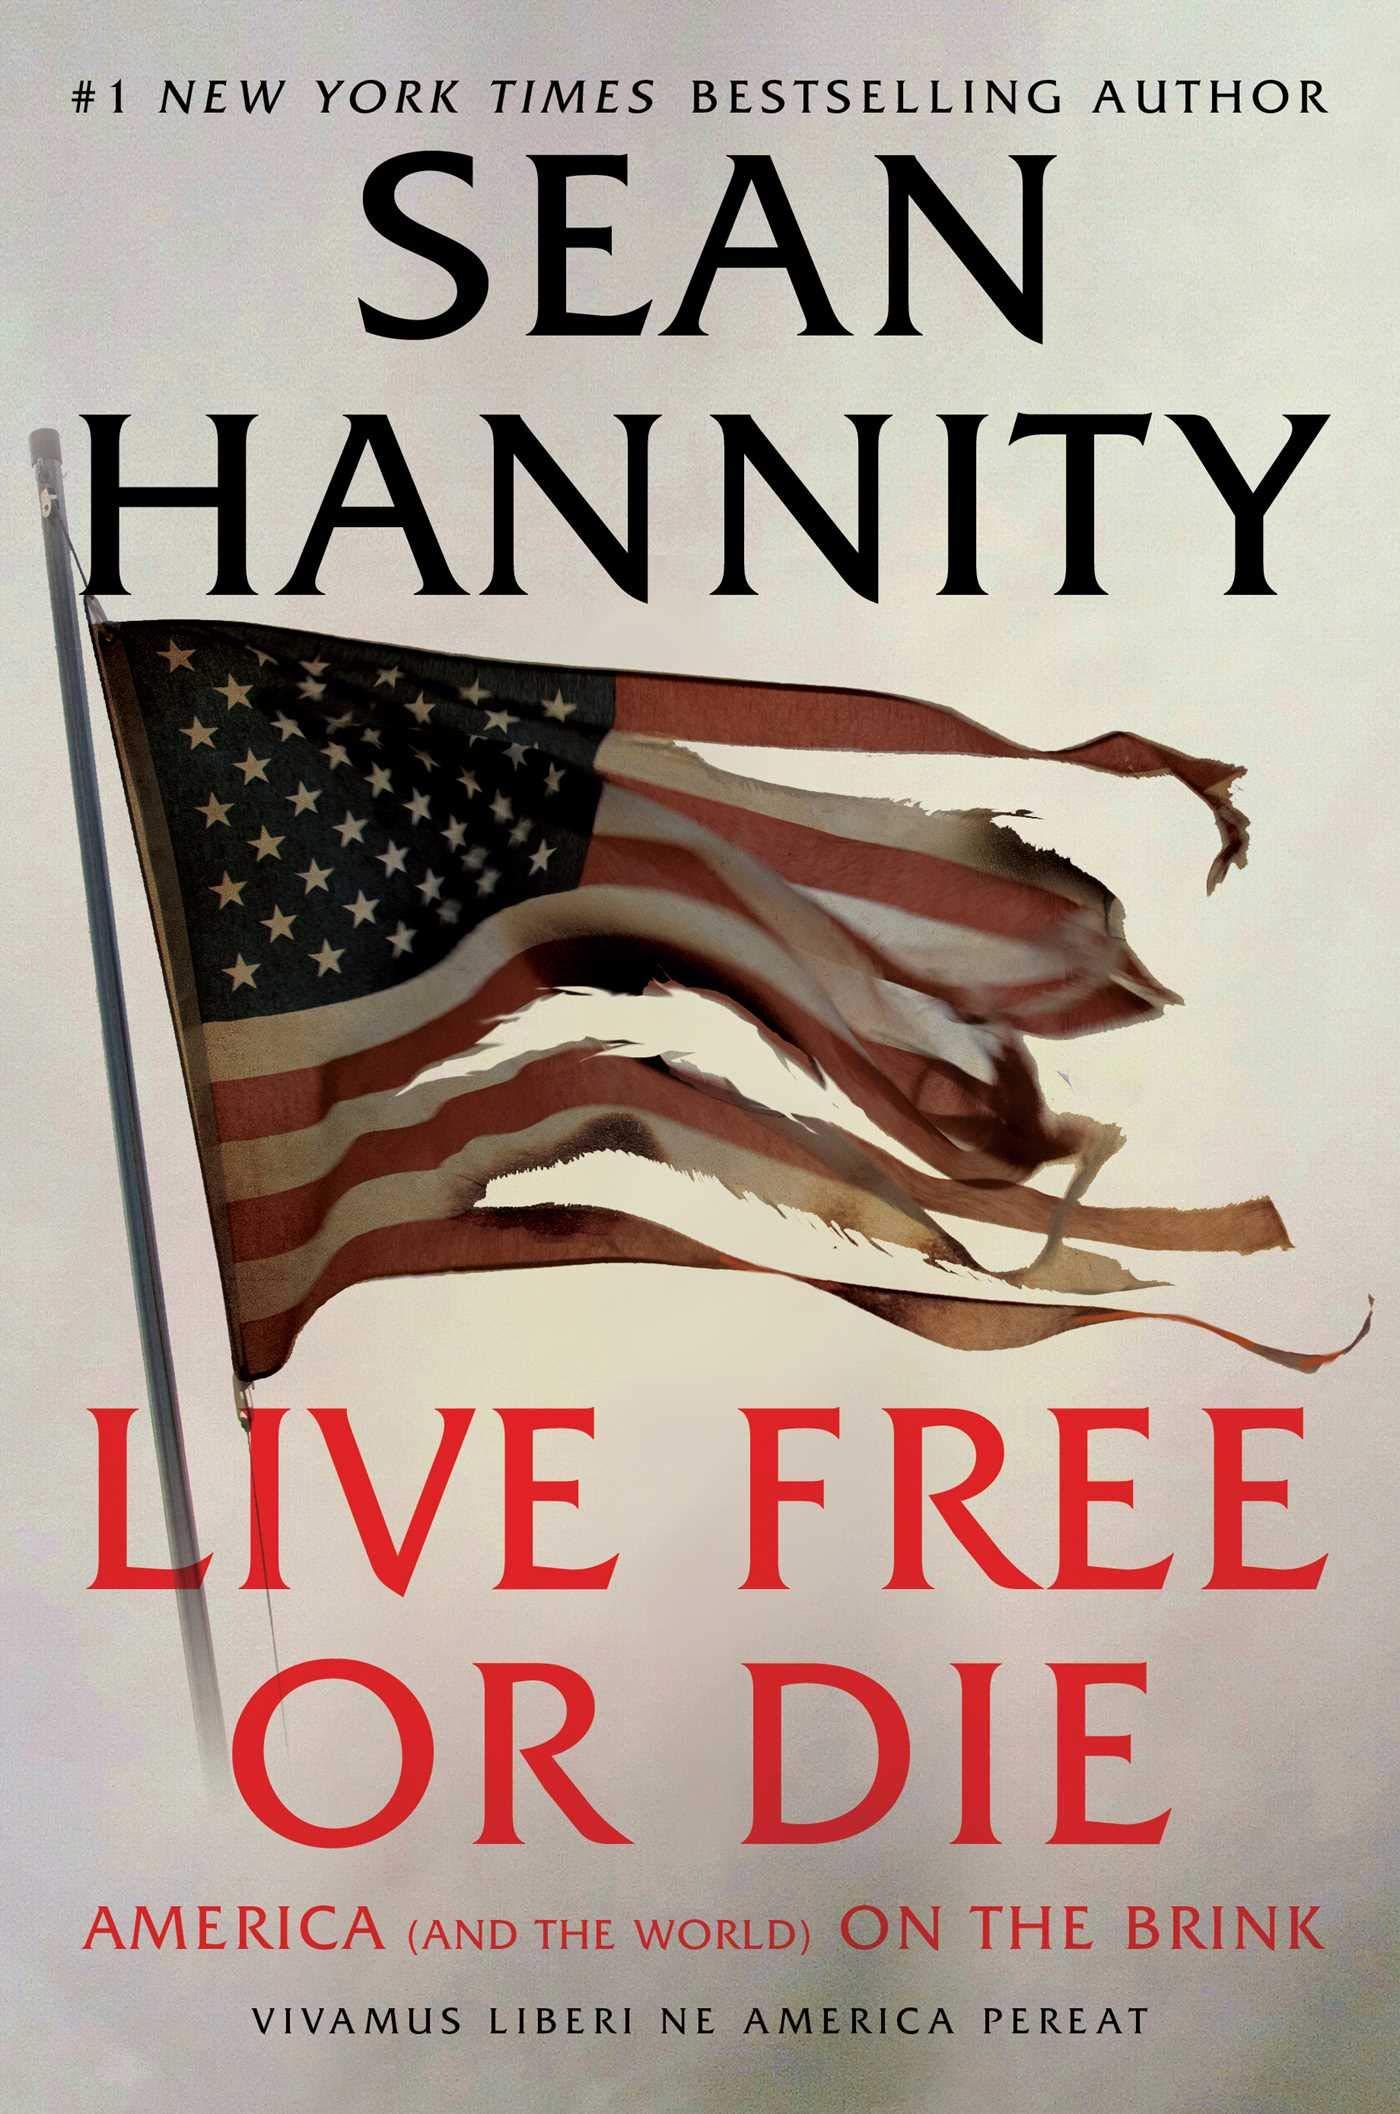 Sean Hannity books